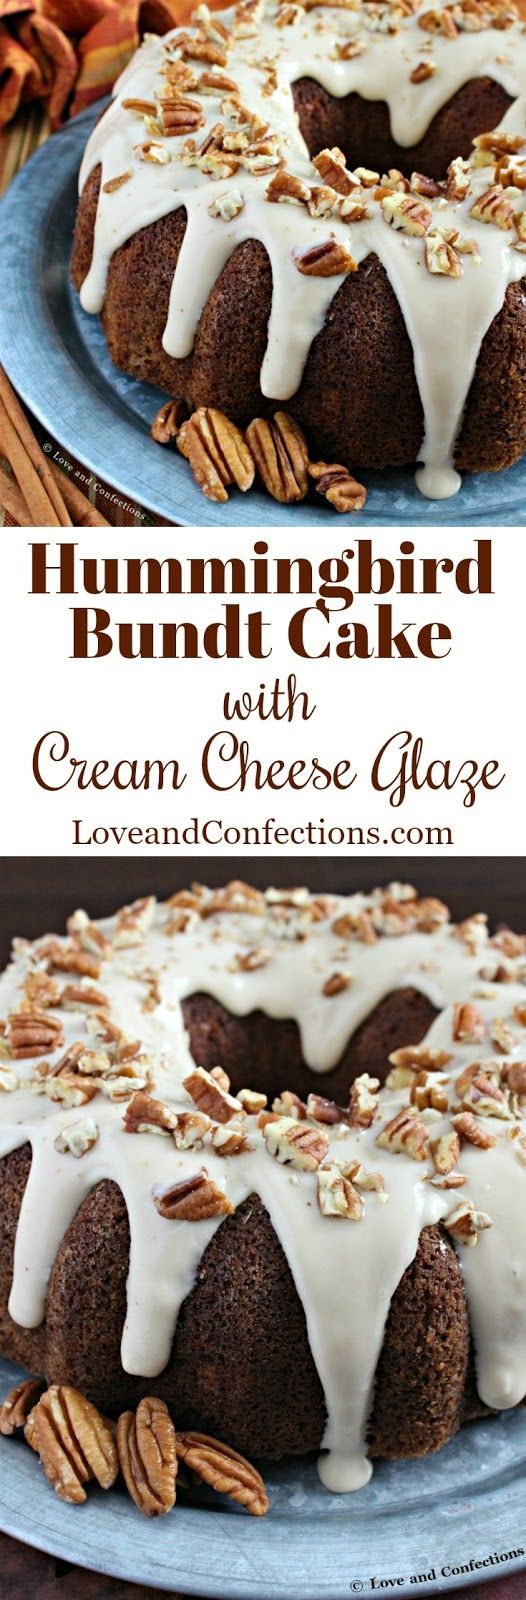 Hummingbird Bundt Cake with Cream Cheese Glaze from LoveandConfections.com #BundtBakers